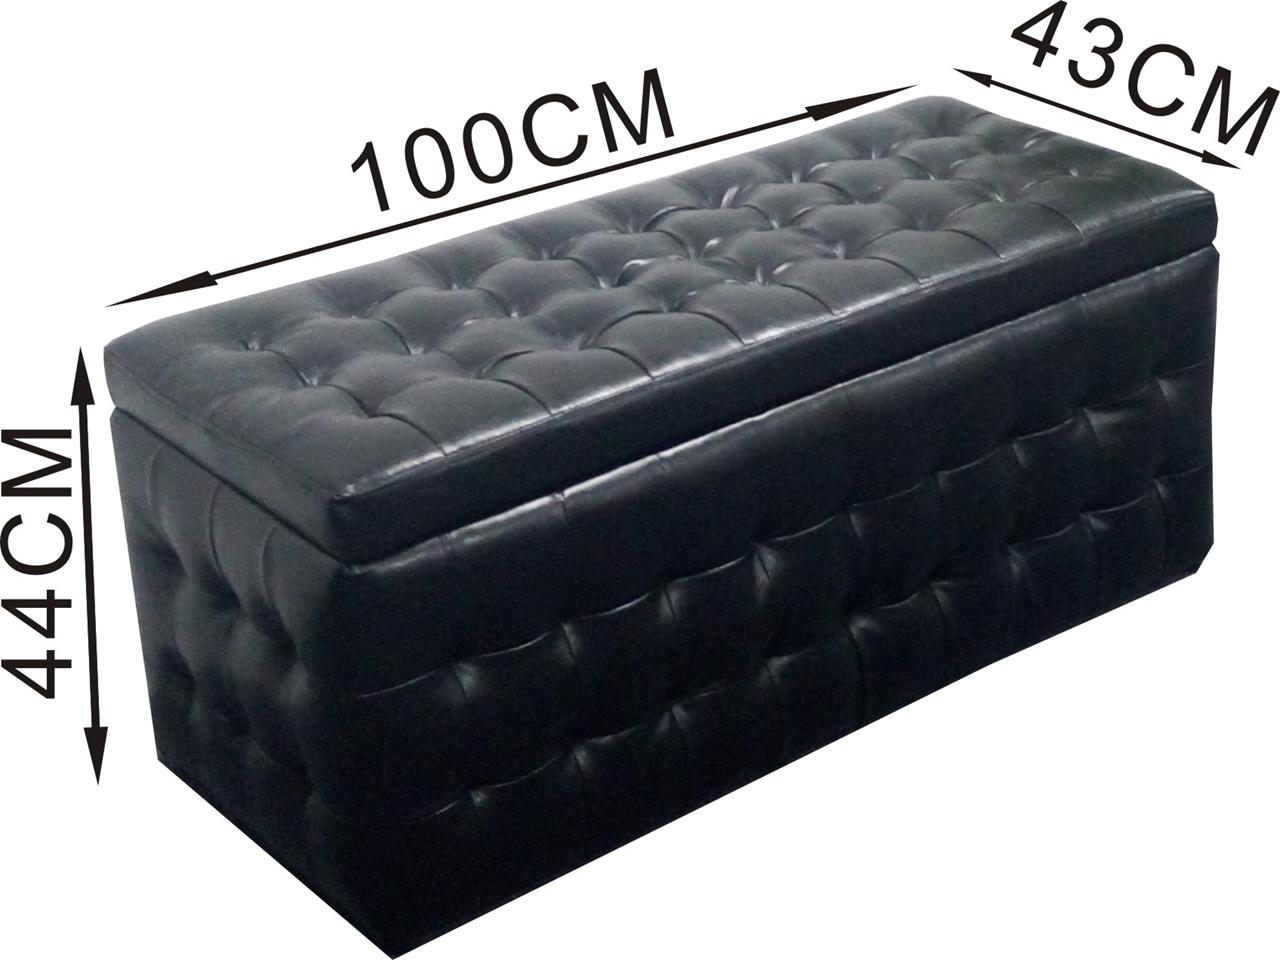 Buy leather storage stooloffice chairergonomic chairtoy for Storage ottoman singapore